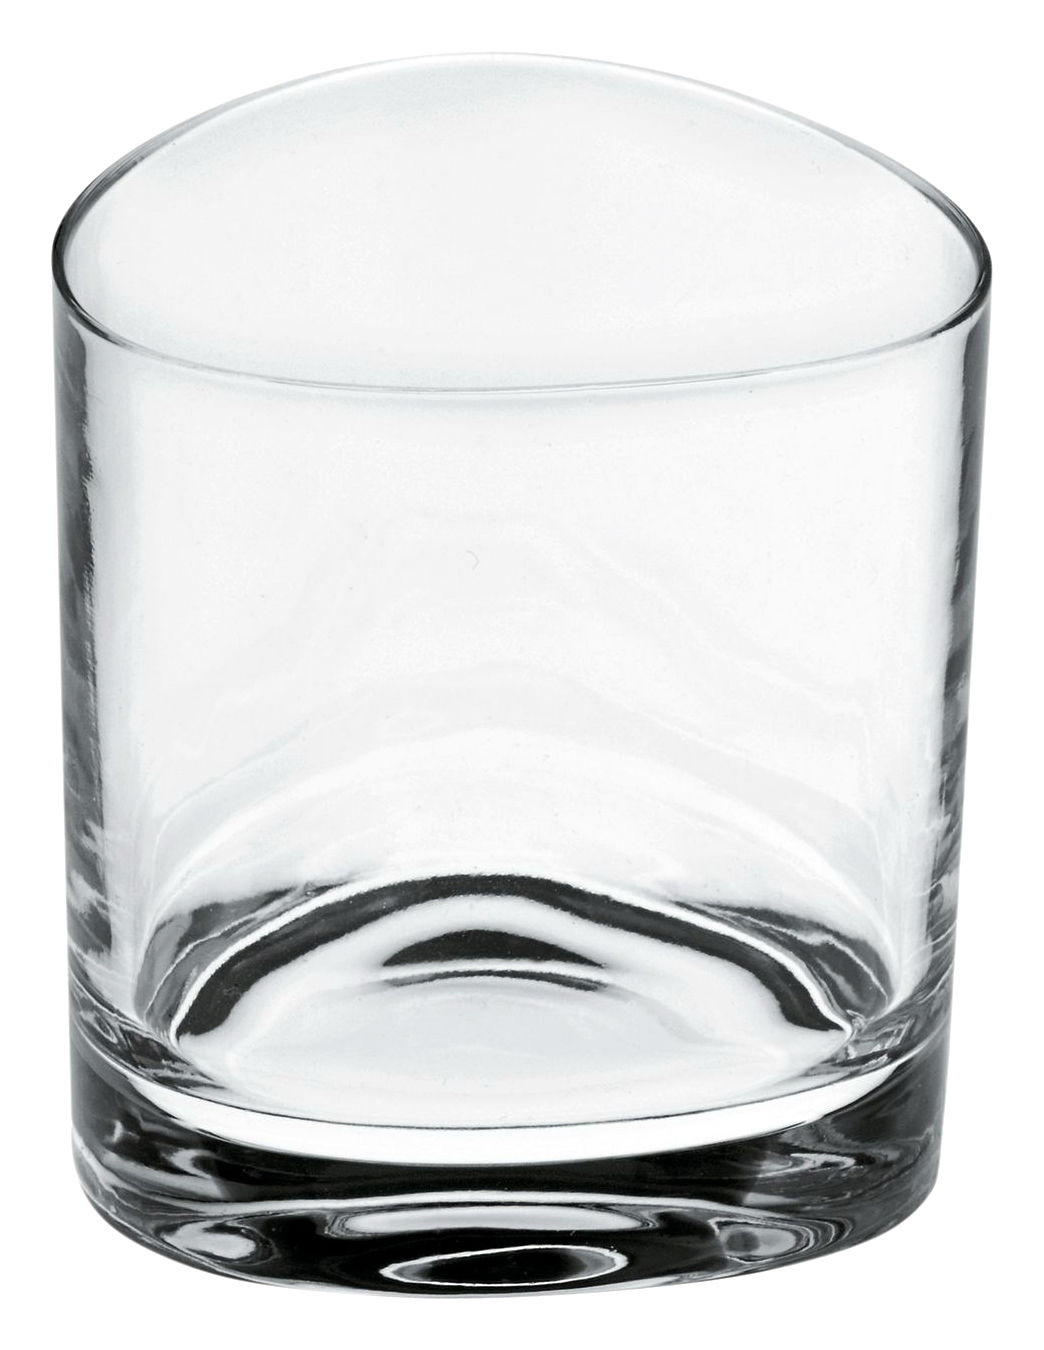 Tischkultur - Gläser - Colombina Weinglas - Alessi - Kristall transparent - H 7,8 cm - Glas